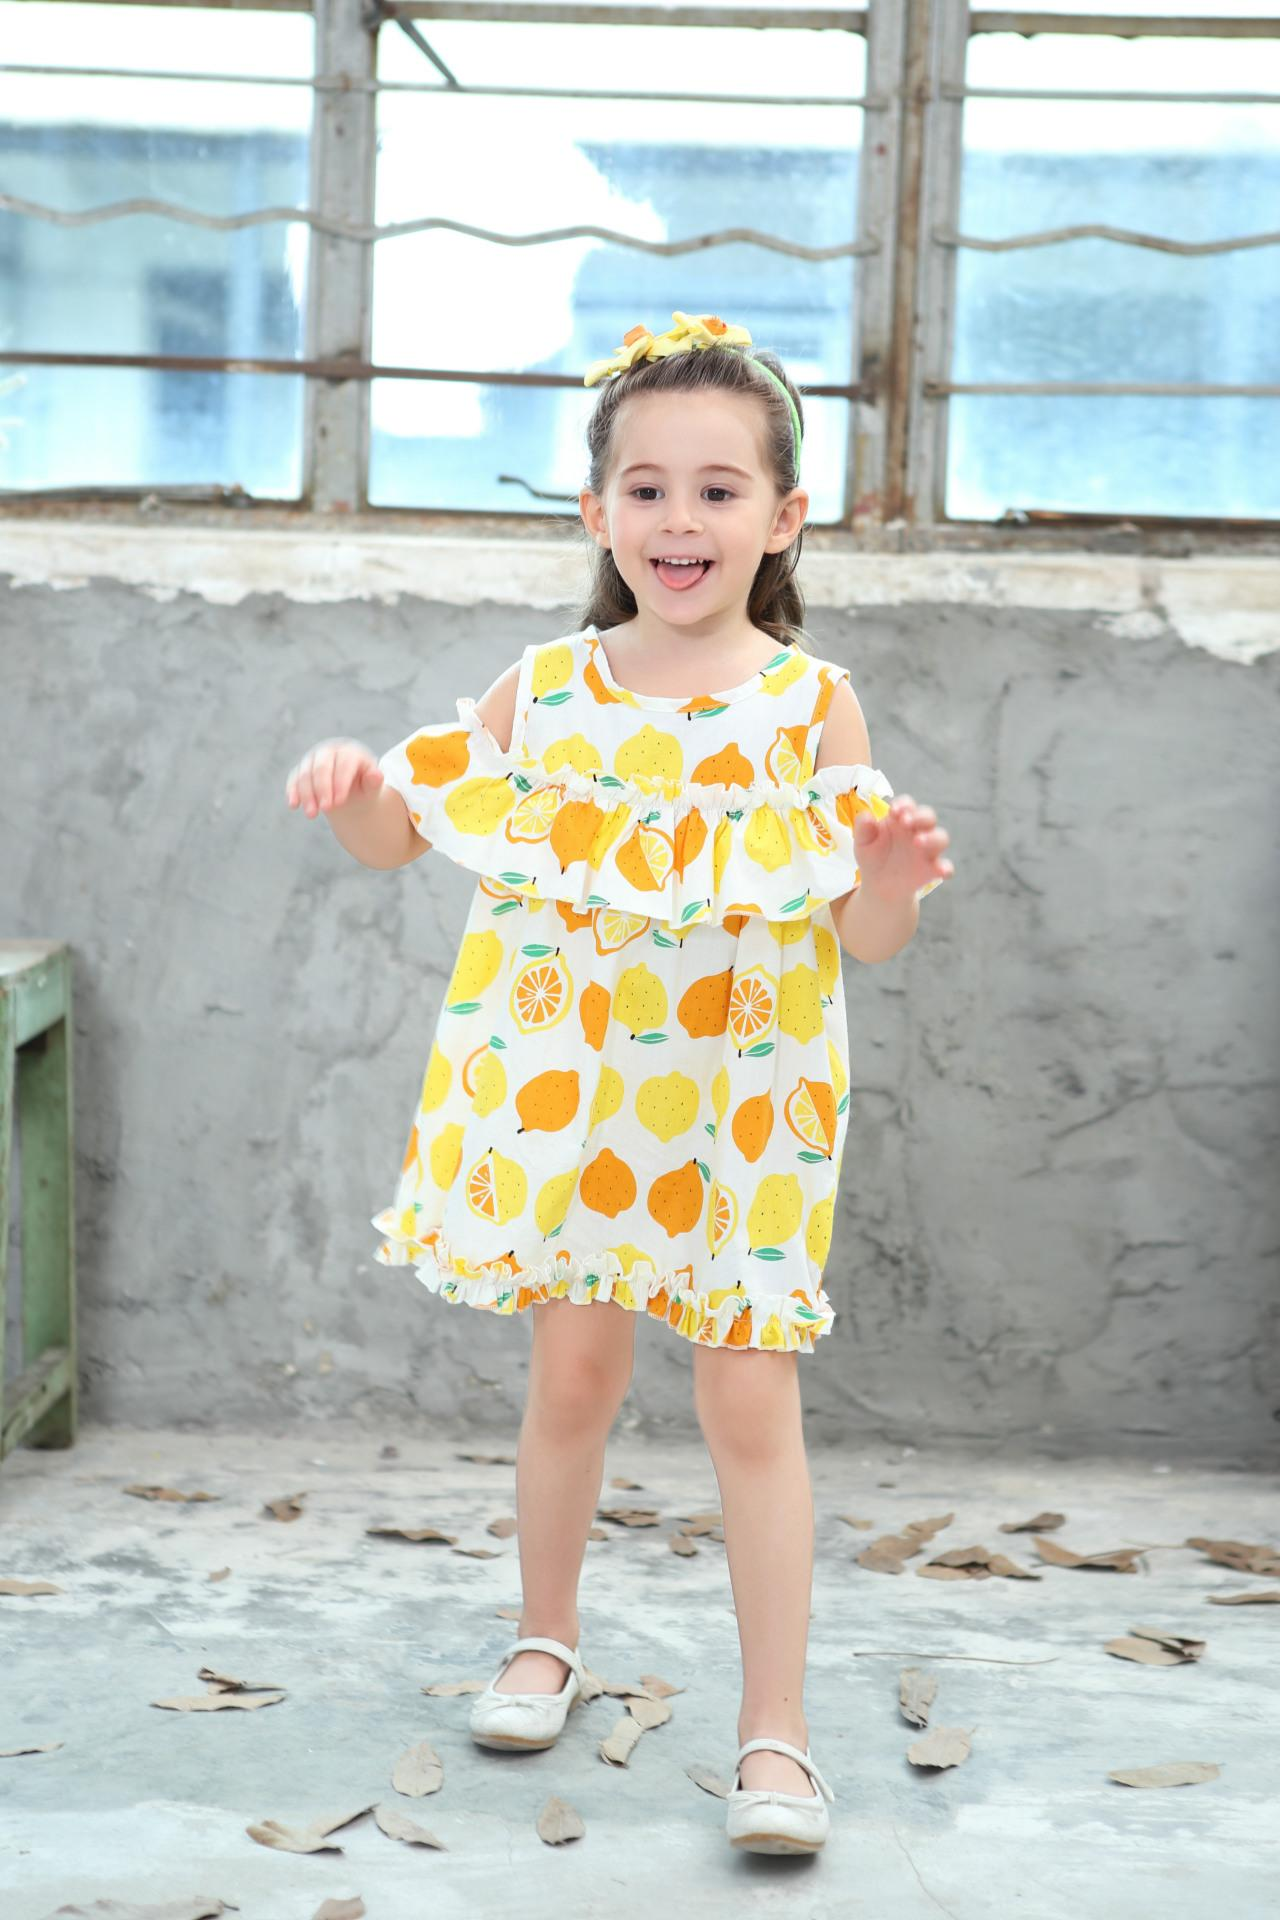 Lemon Printd Girls Dress 2018 New Summer Fashion Children Princess Dress Kids Children Clothes For 2 3 4 5 6 7 8 Years 4